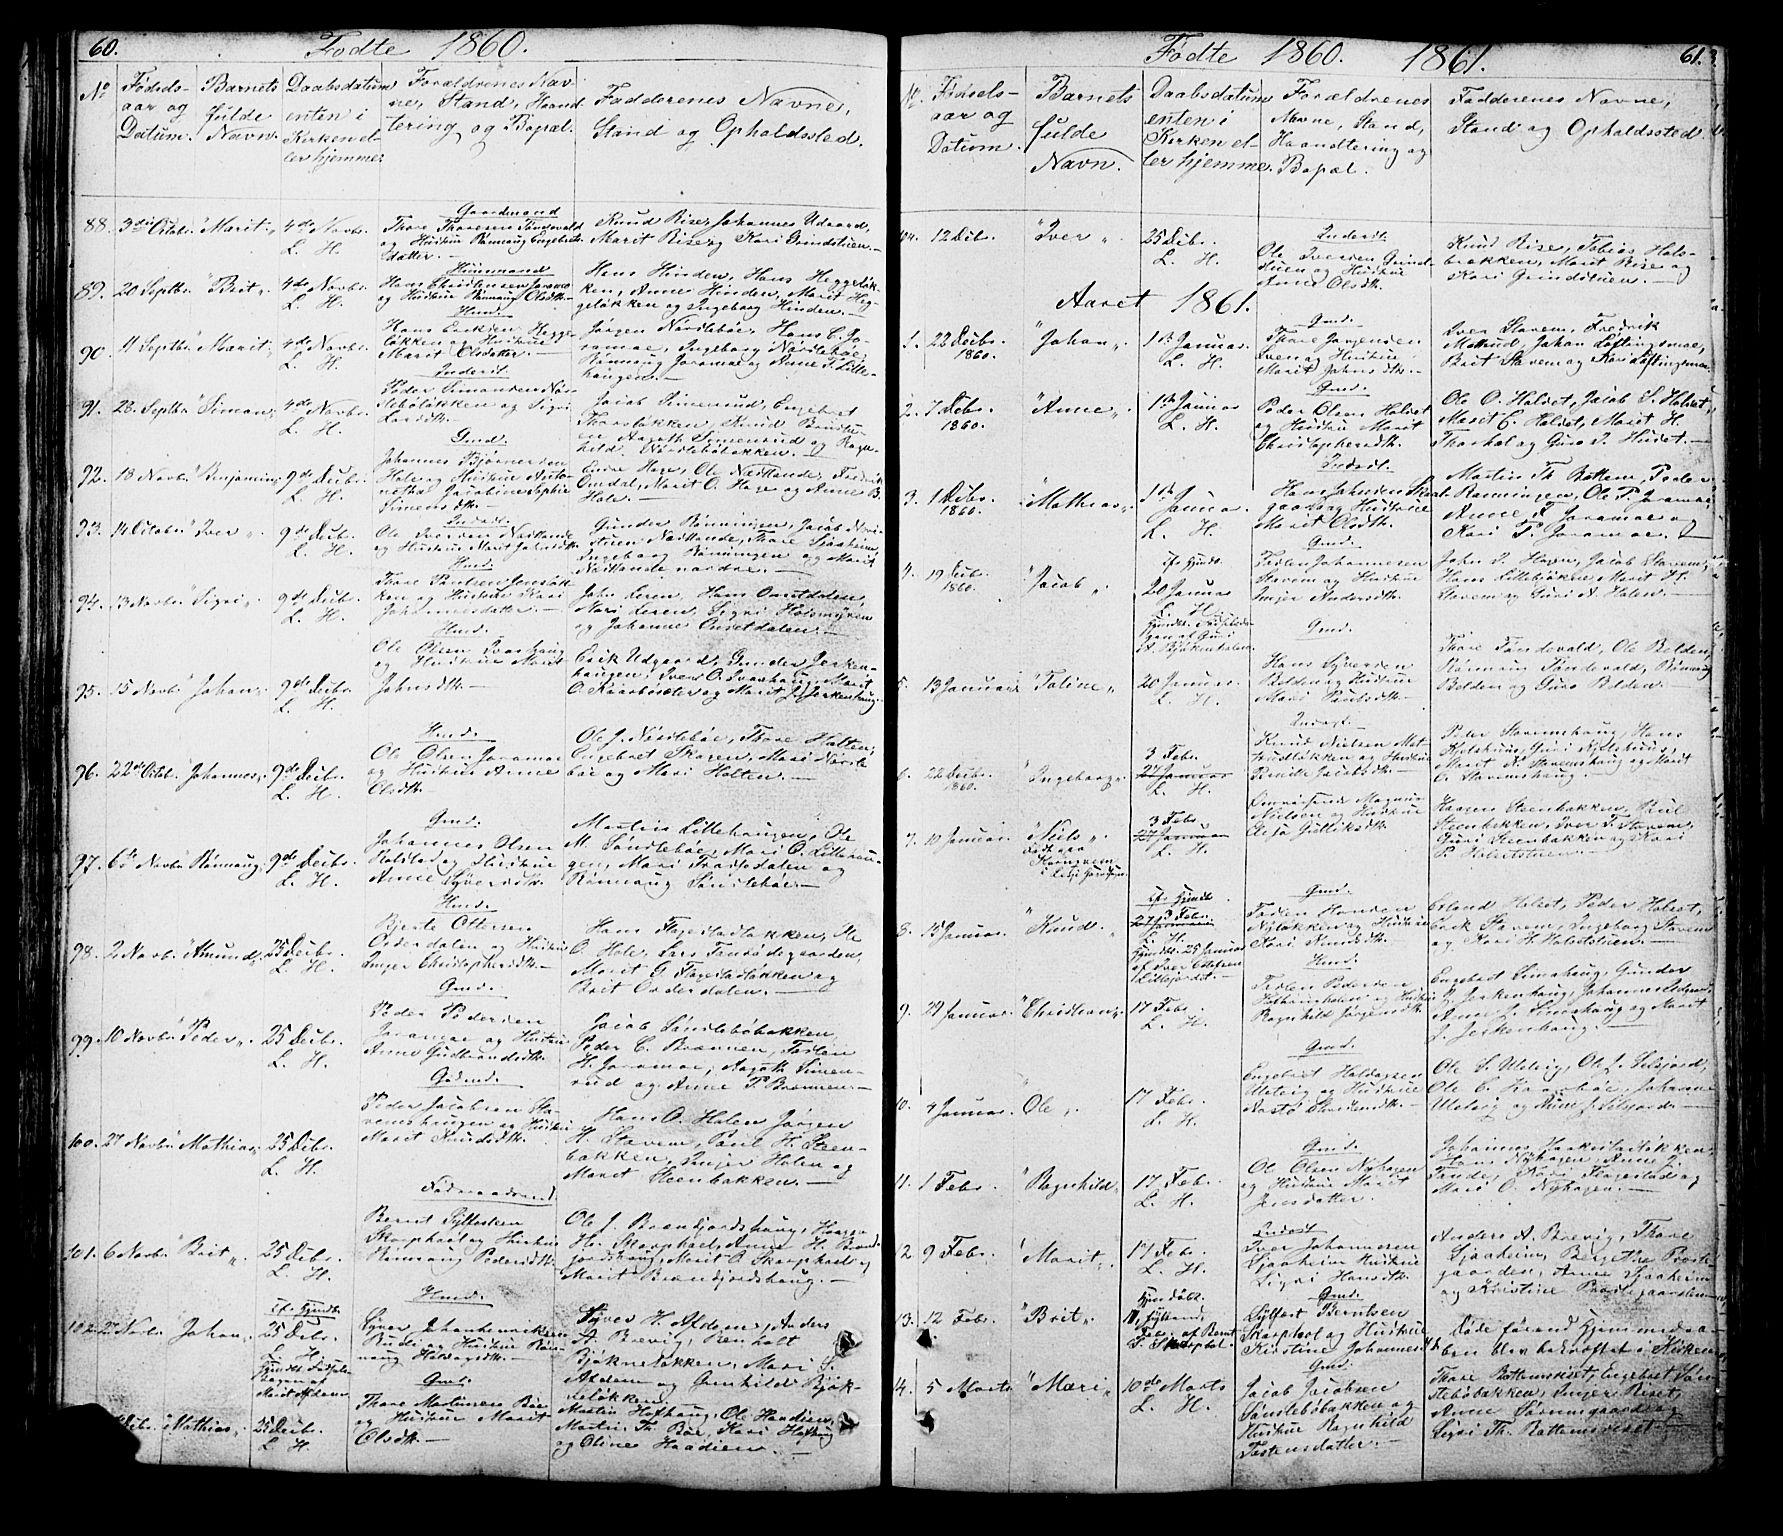 SAH, Lesja prestekontor, Klokkerbok nr. 5, 1850-1894, s. 60-61